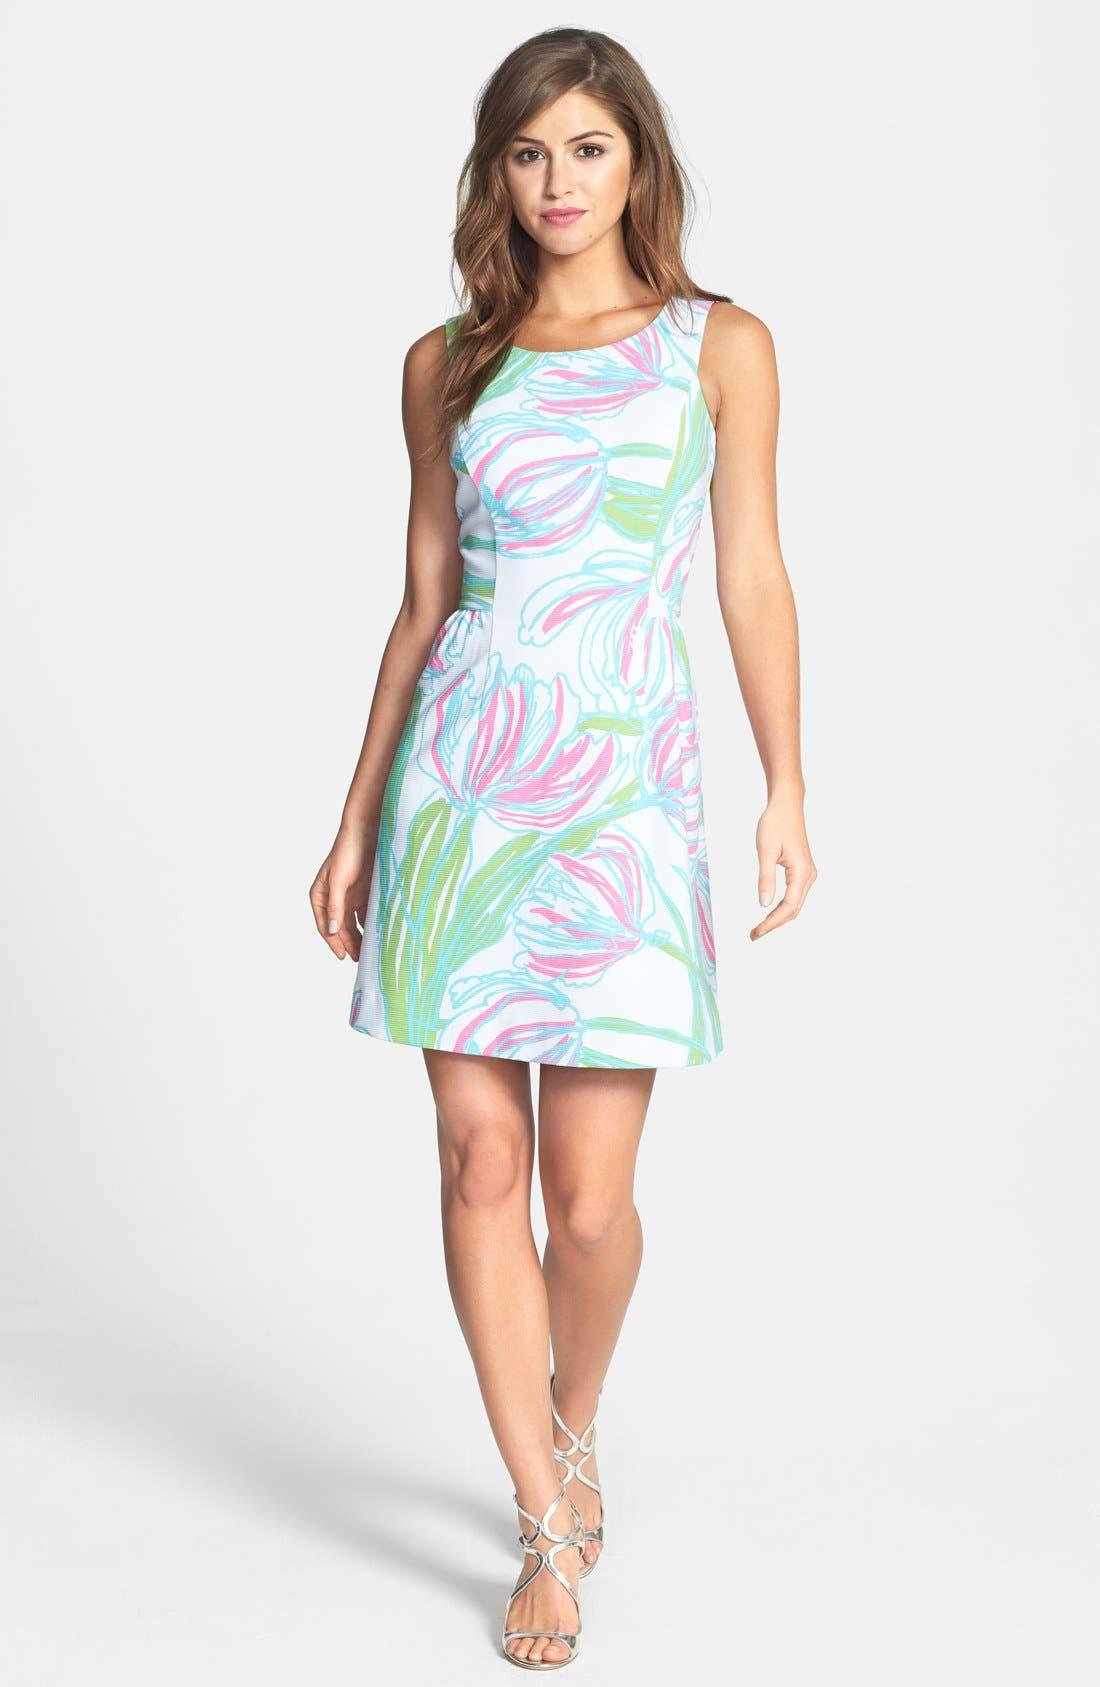 Alternate Image 1 Selected - Lilly Pulitzer® 'Bella' Print Ottoman Knit Dress